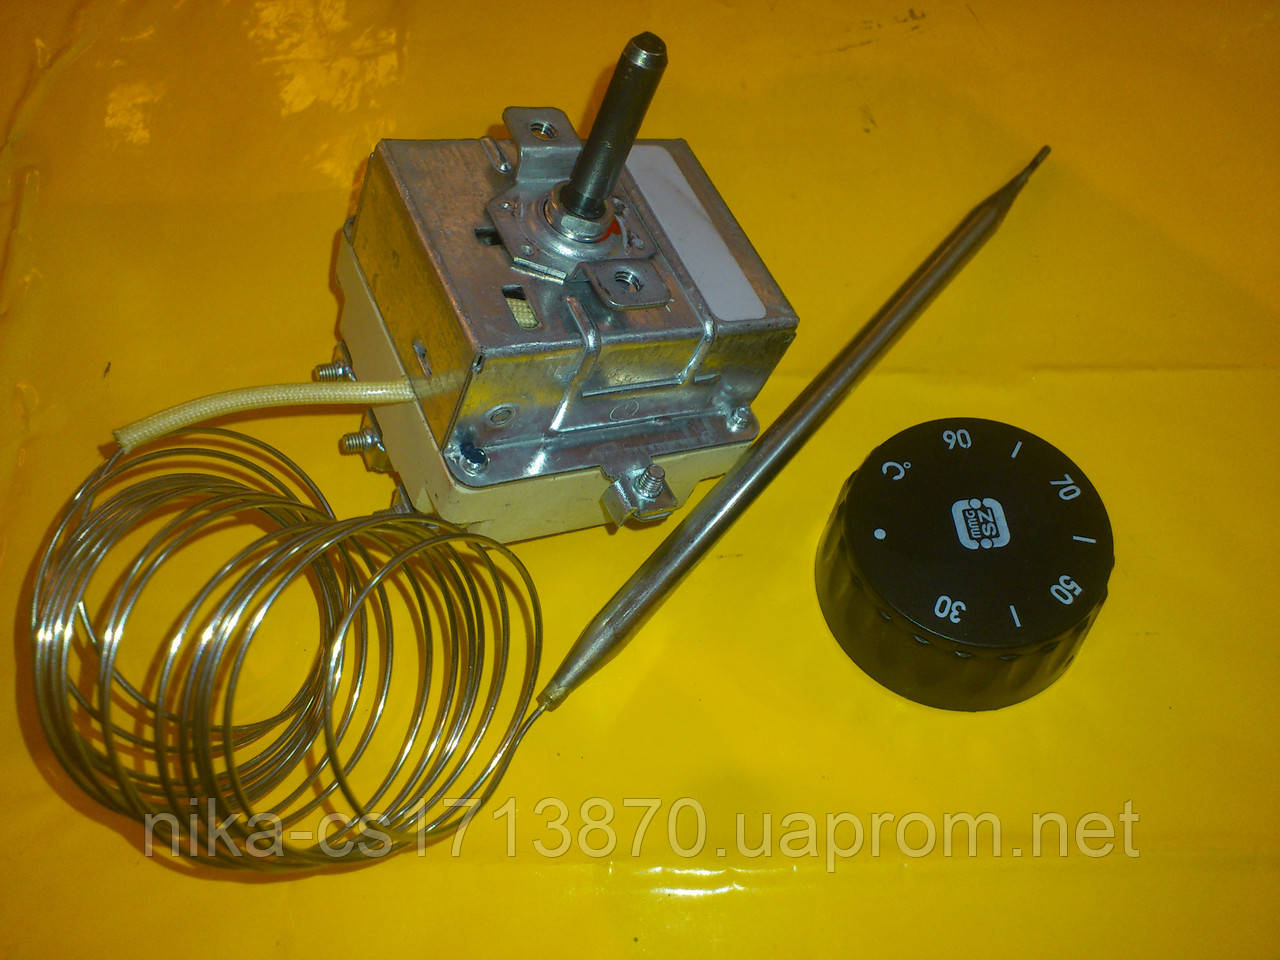 Терморегулятор MMG - 90 ℃ / 3-х полюсный капилярный 2.2 м. производство Венгрия